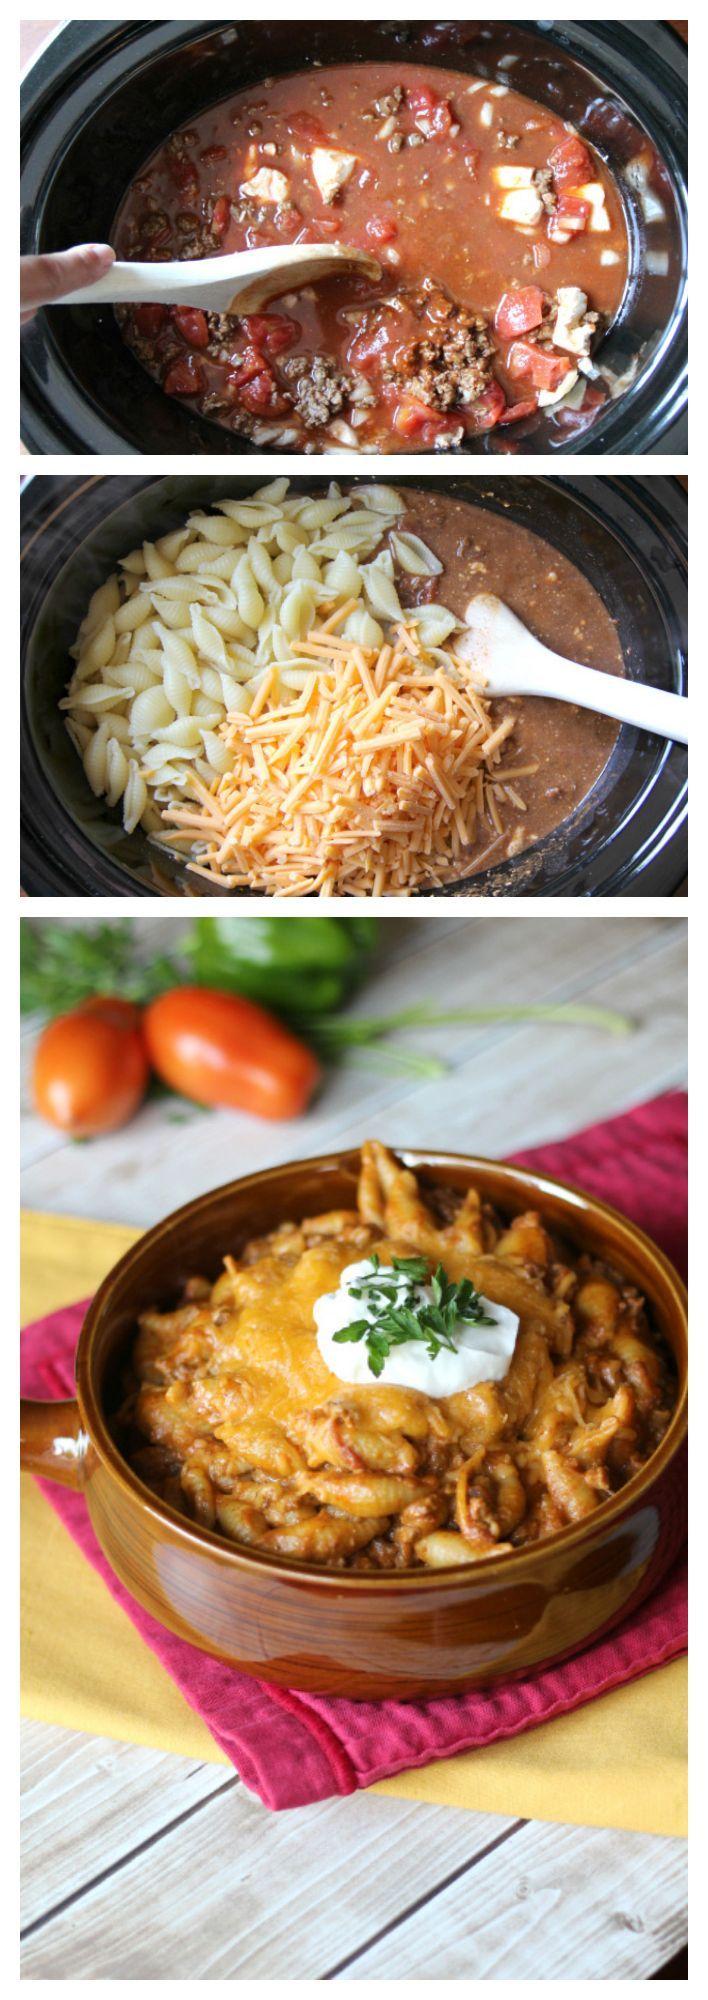 Easy Slow Cooker Taco Pasta